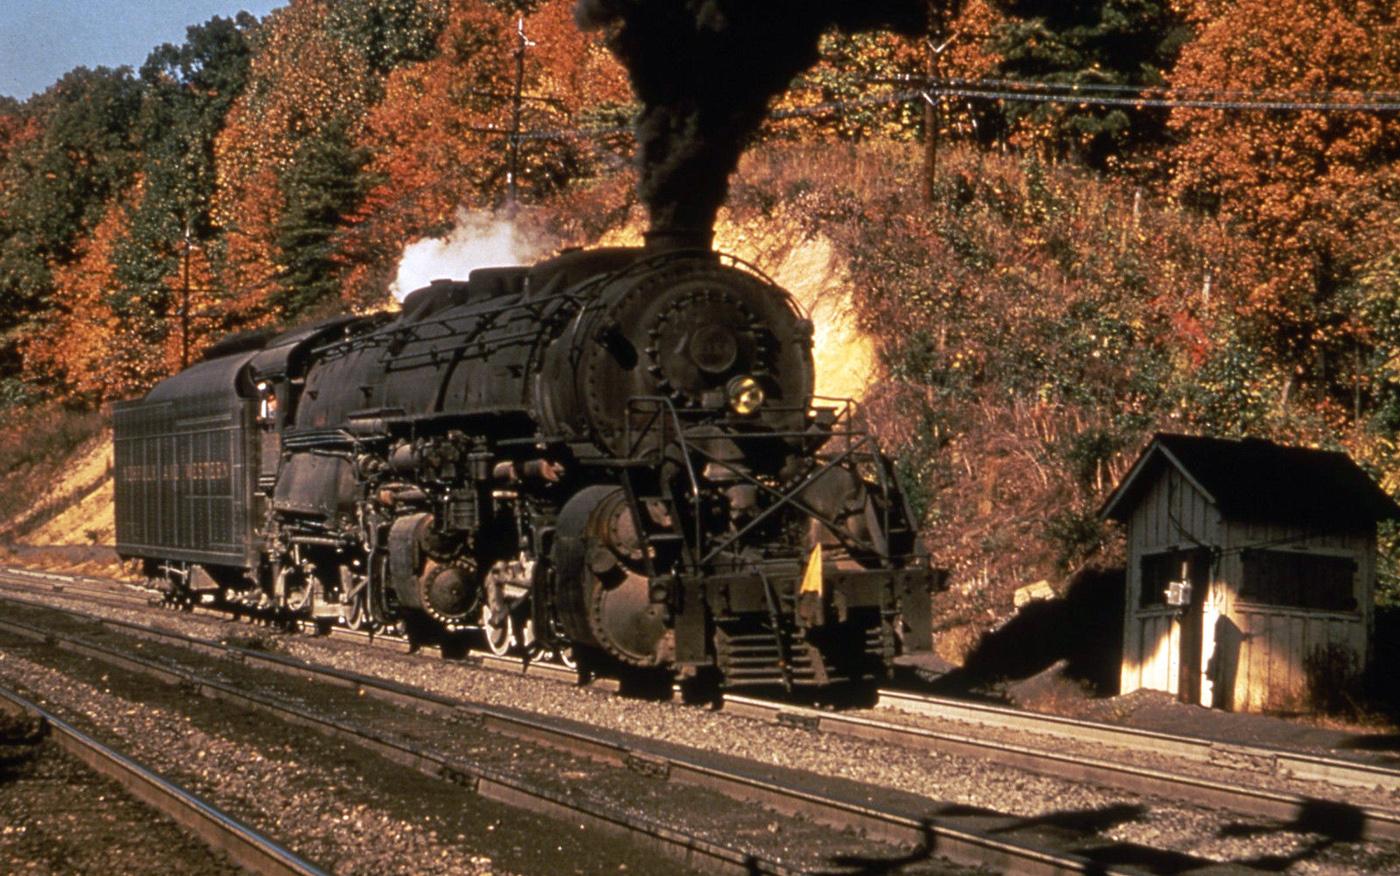 Compound Locomotive